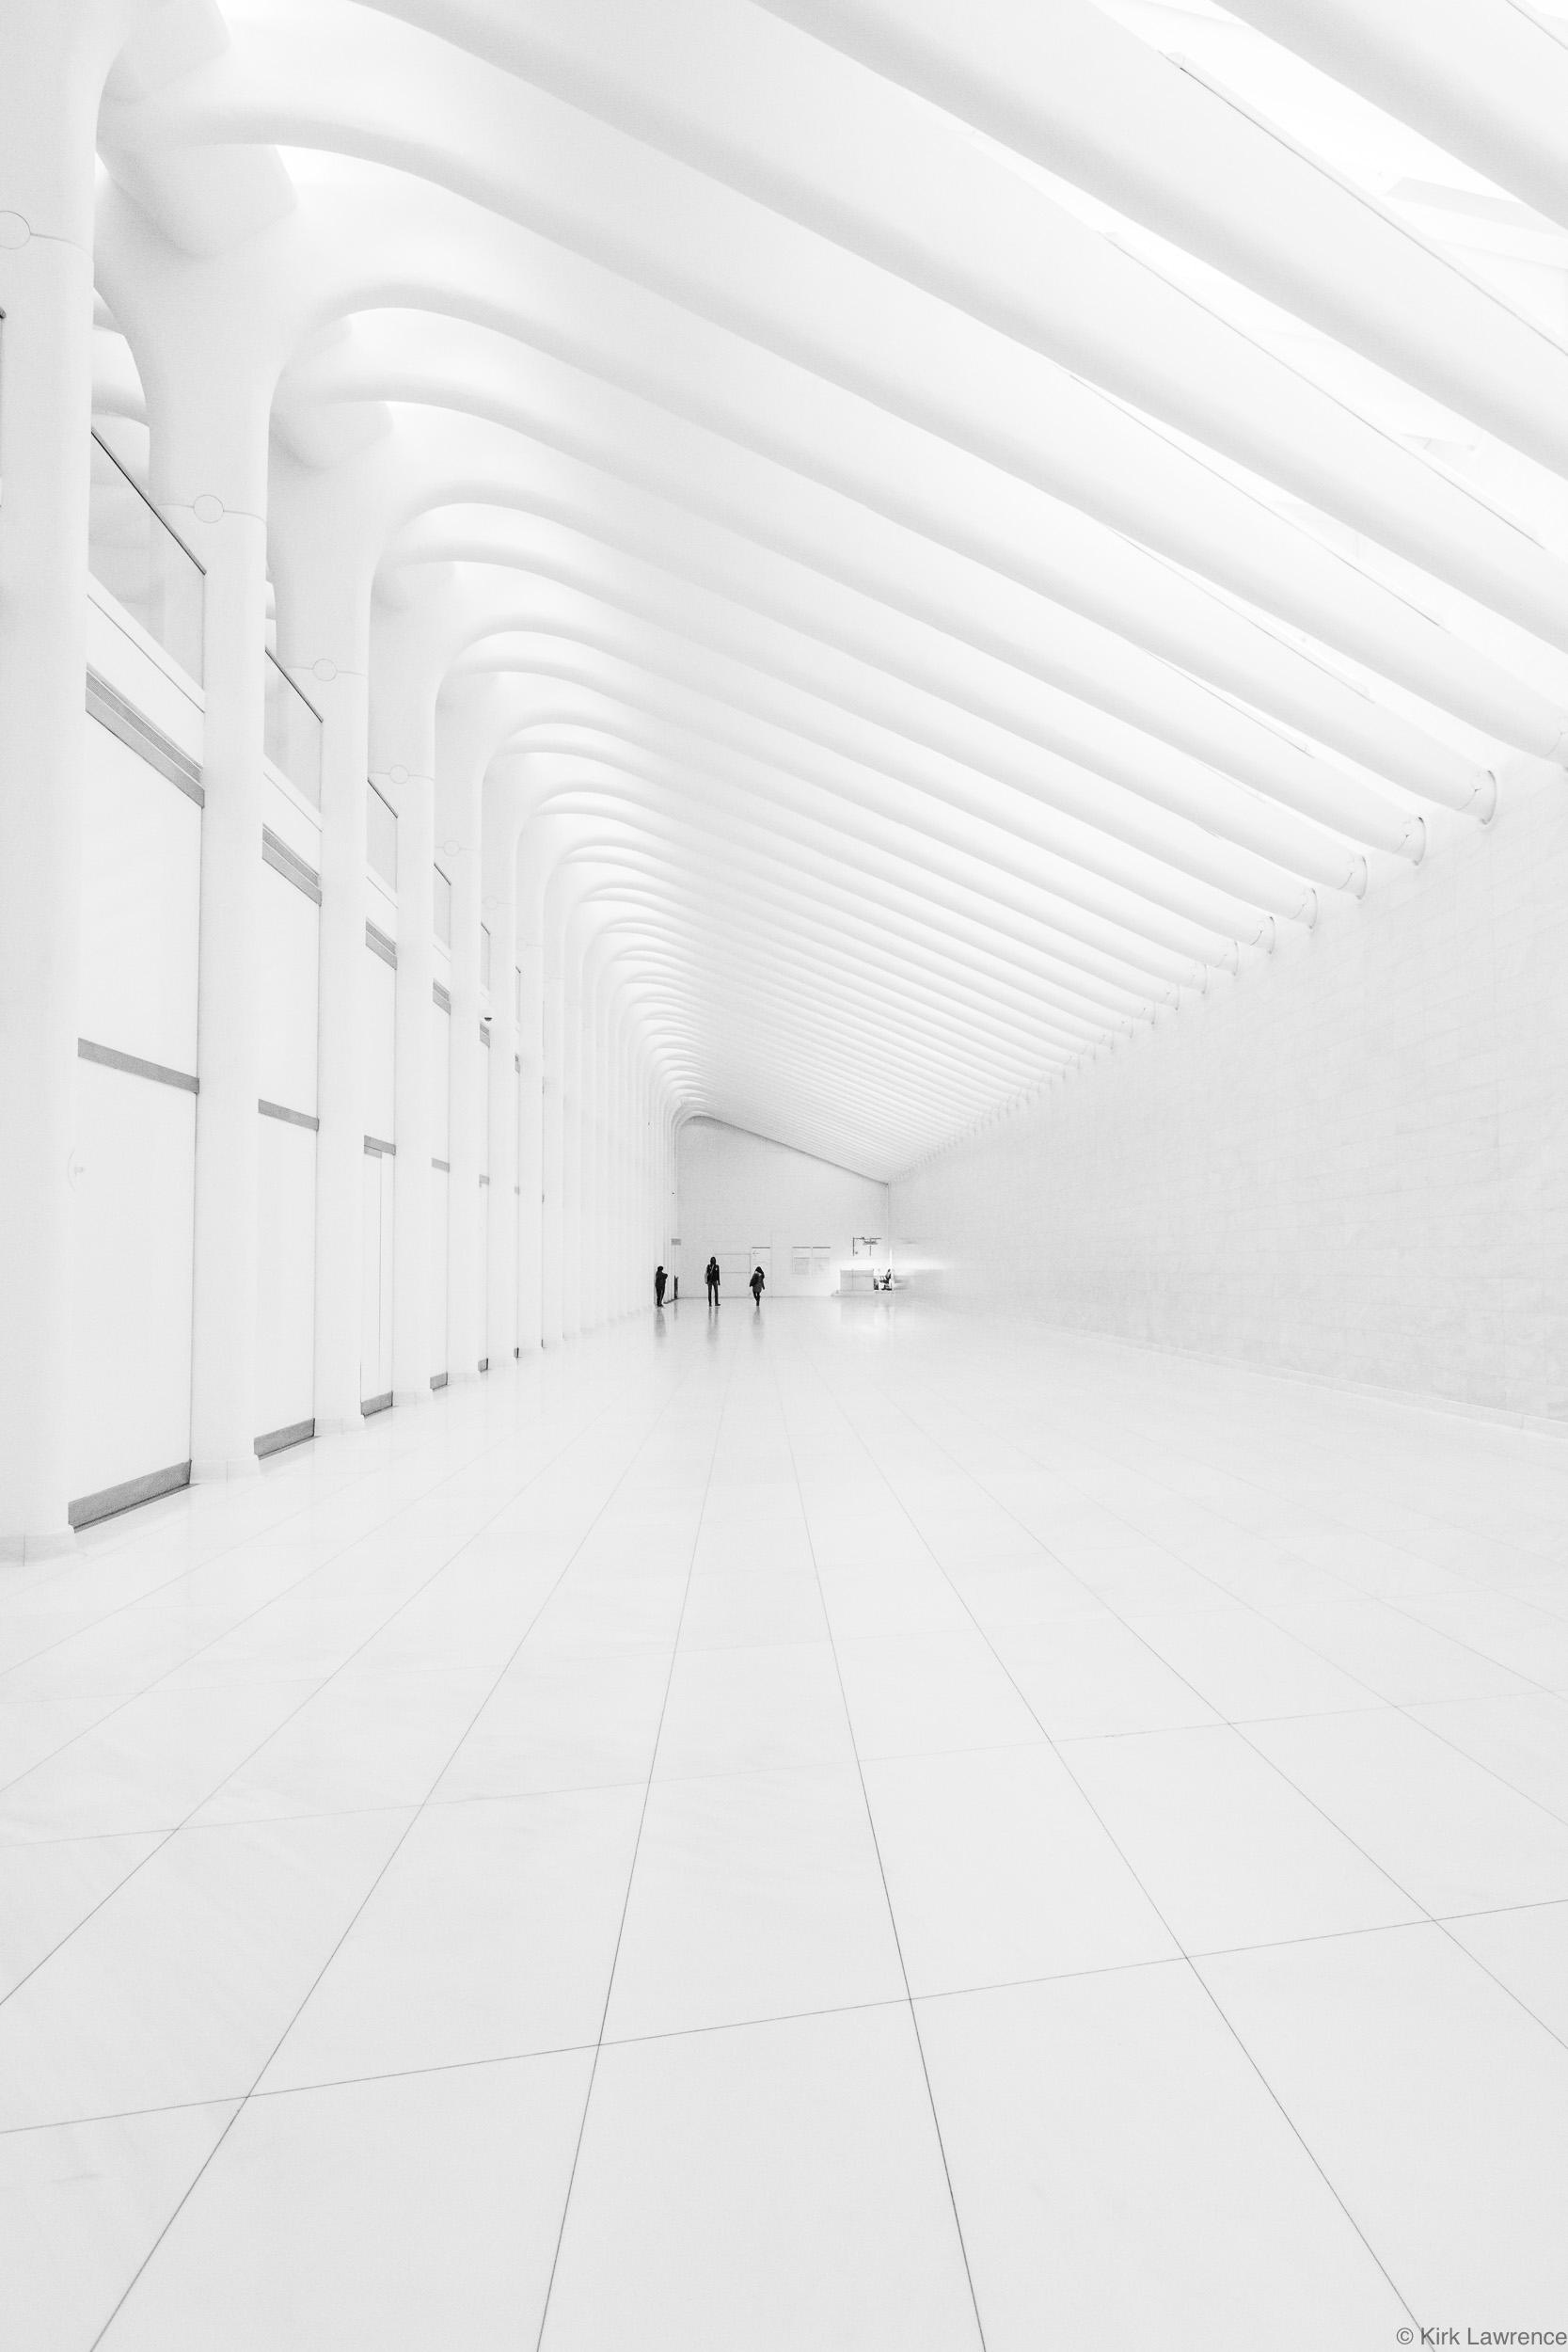 Dey_Street_Passageway_Concourse_New_York_City.jpg